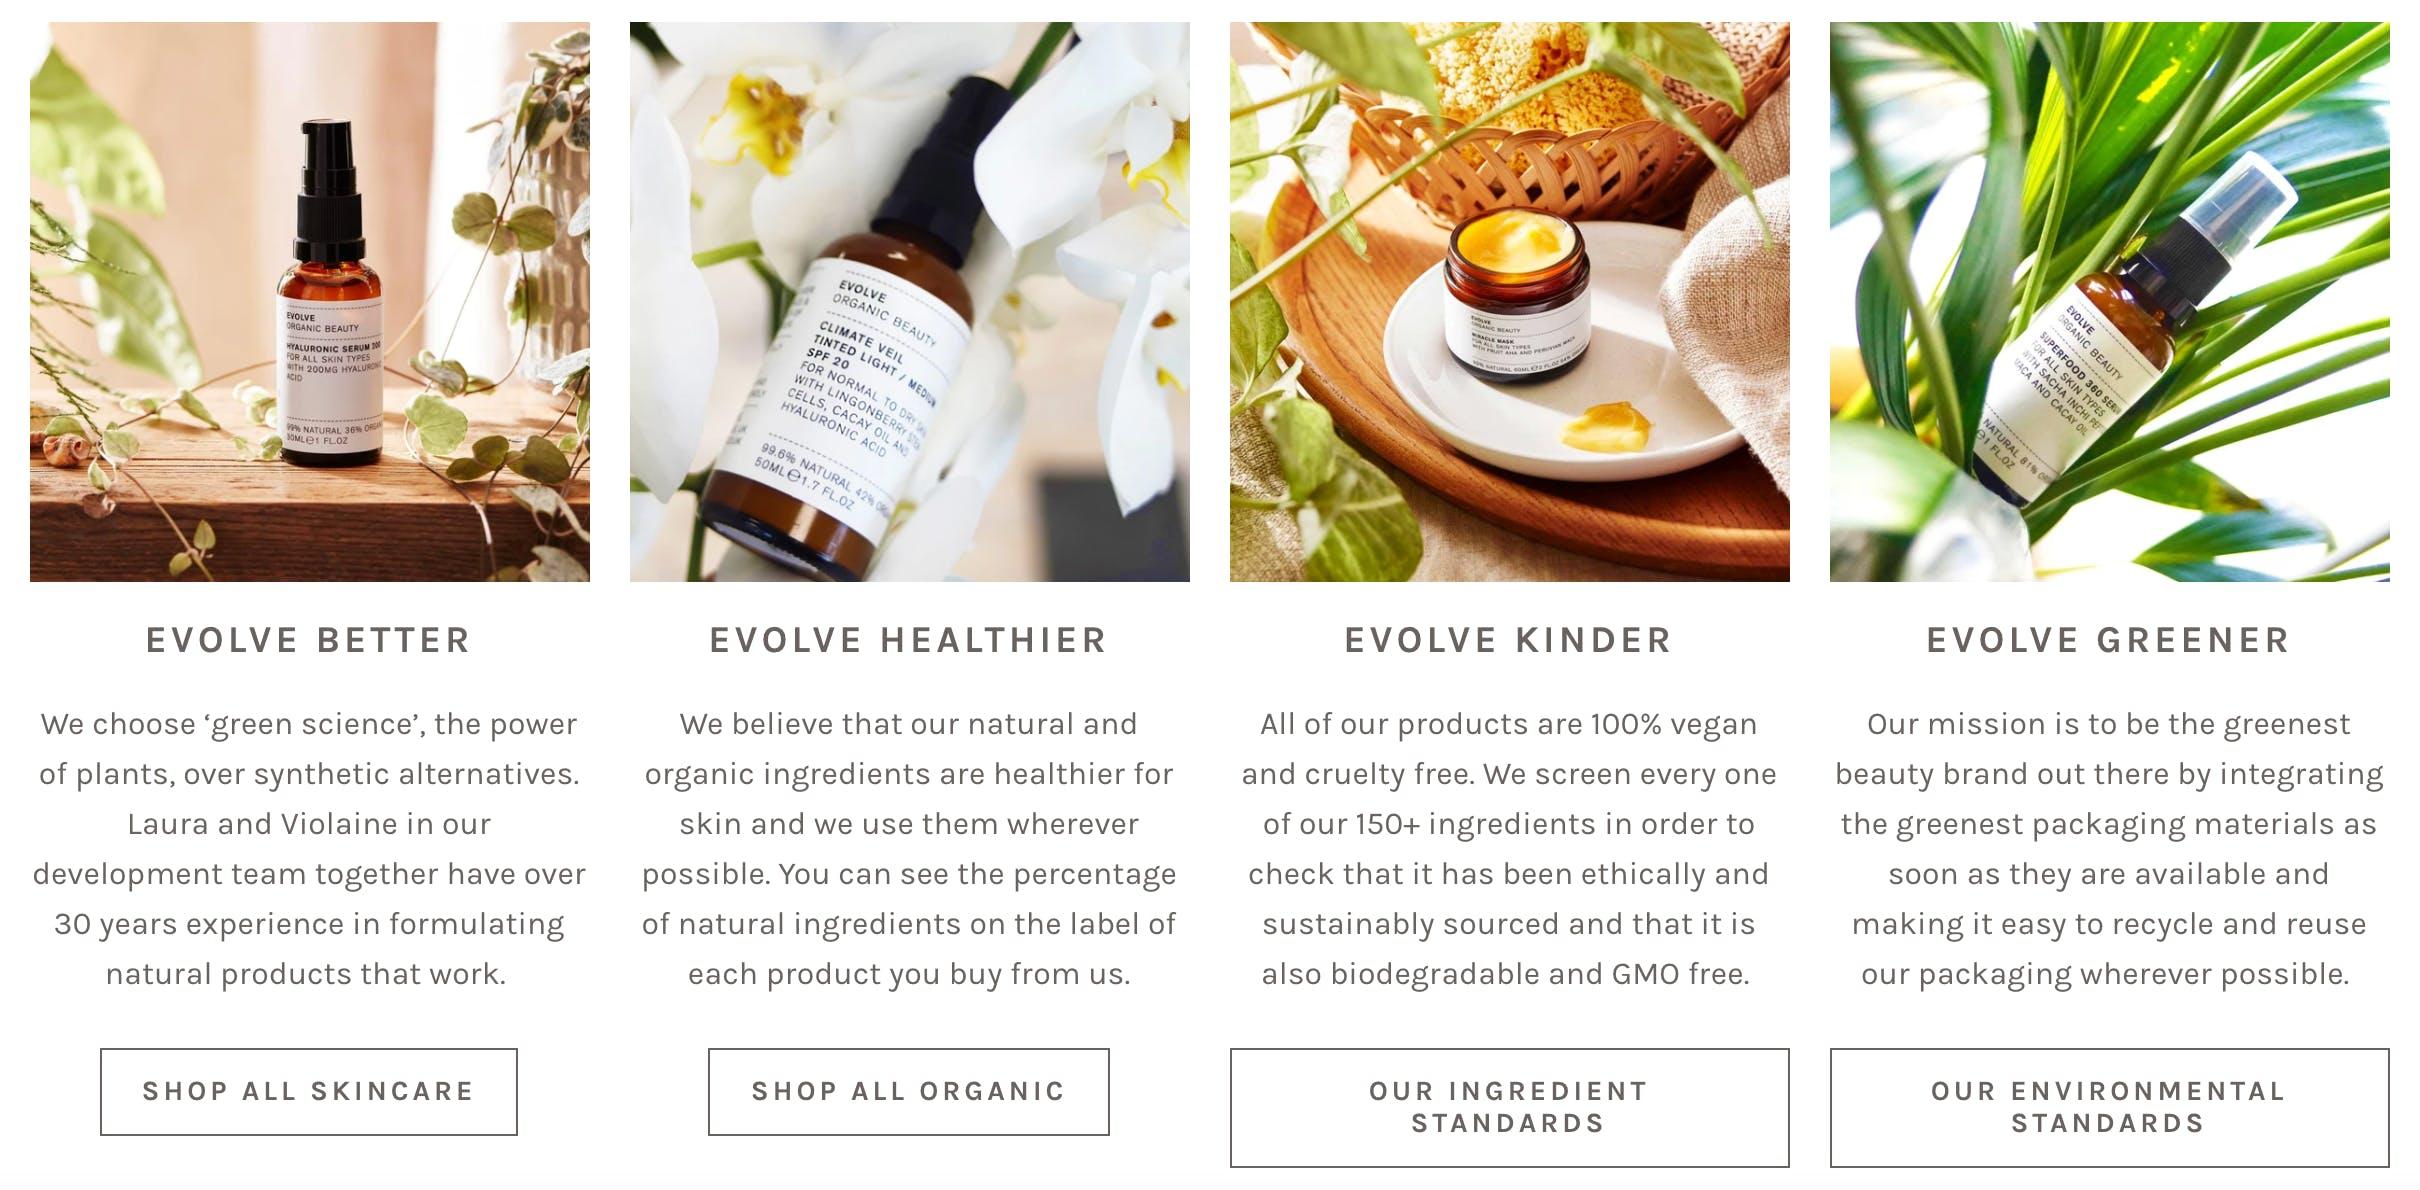 Evolve Beauty Website